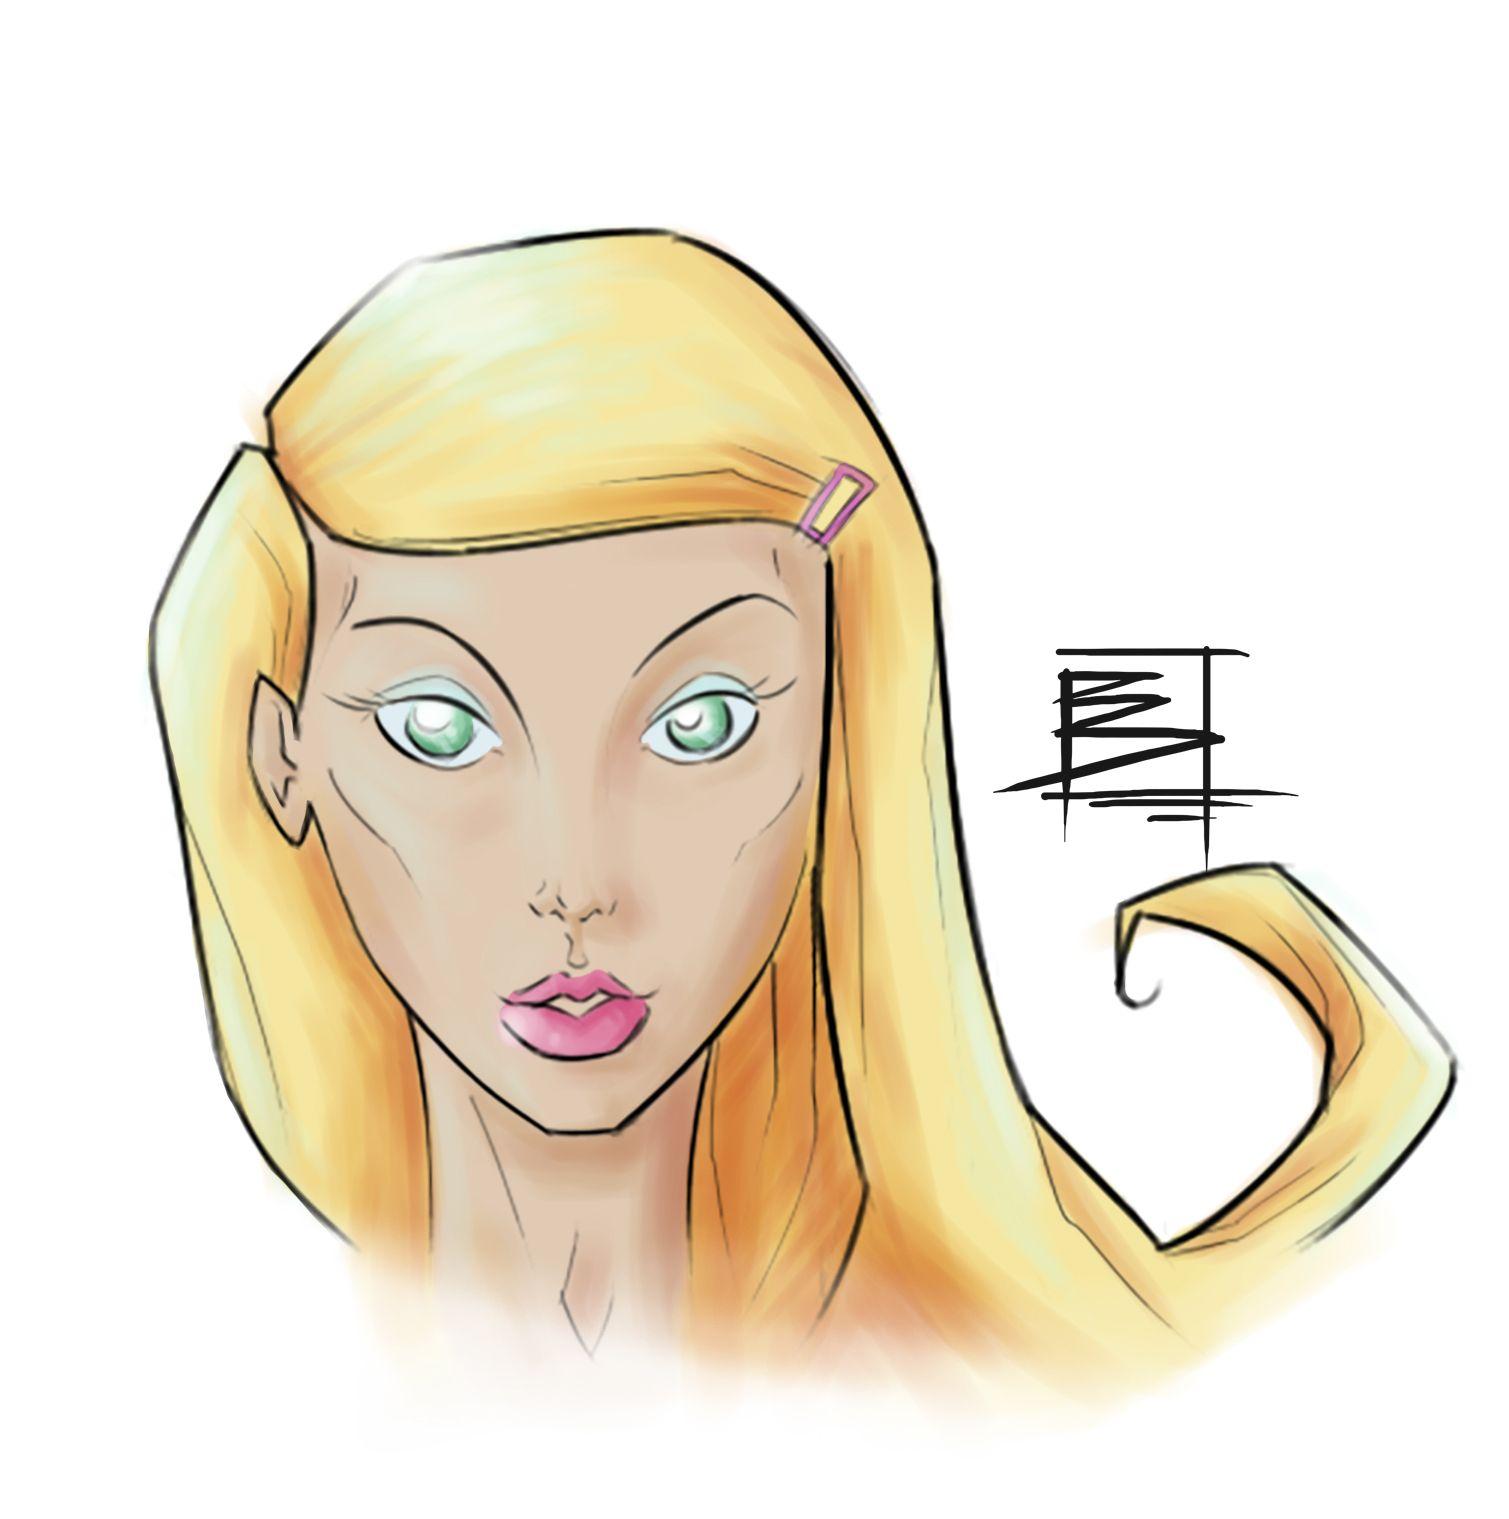 Karen in digital colors! Coloration training #1 with Manga Studio! #pin #pinoftheday #daredevil #netflix #colors #mangastudio #digital #portrait #girl #female #art #artoftheday #comics #tvseries